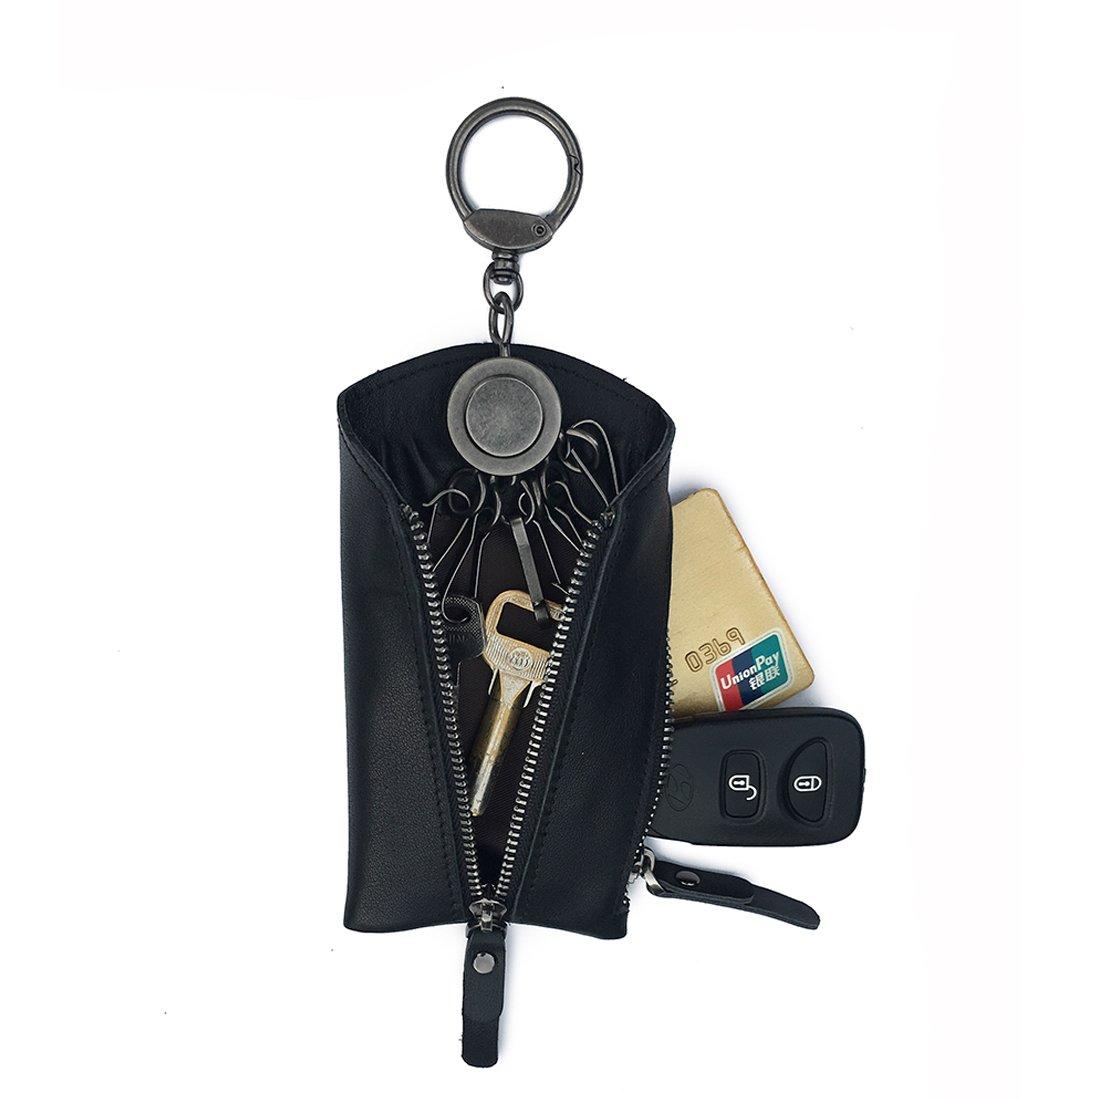 YTTAO Genuine Leather Keychain Wallet/Keyring Wallet/Keychain Pouch/car Key Leather Holder (Black)